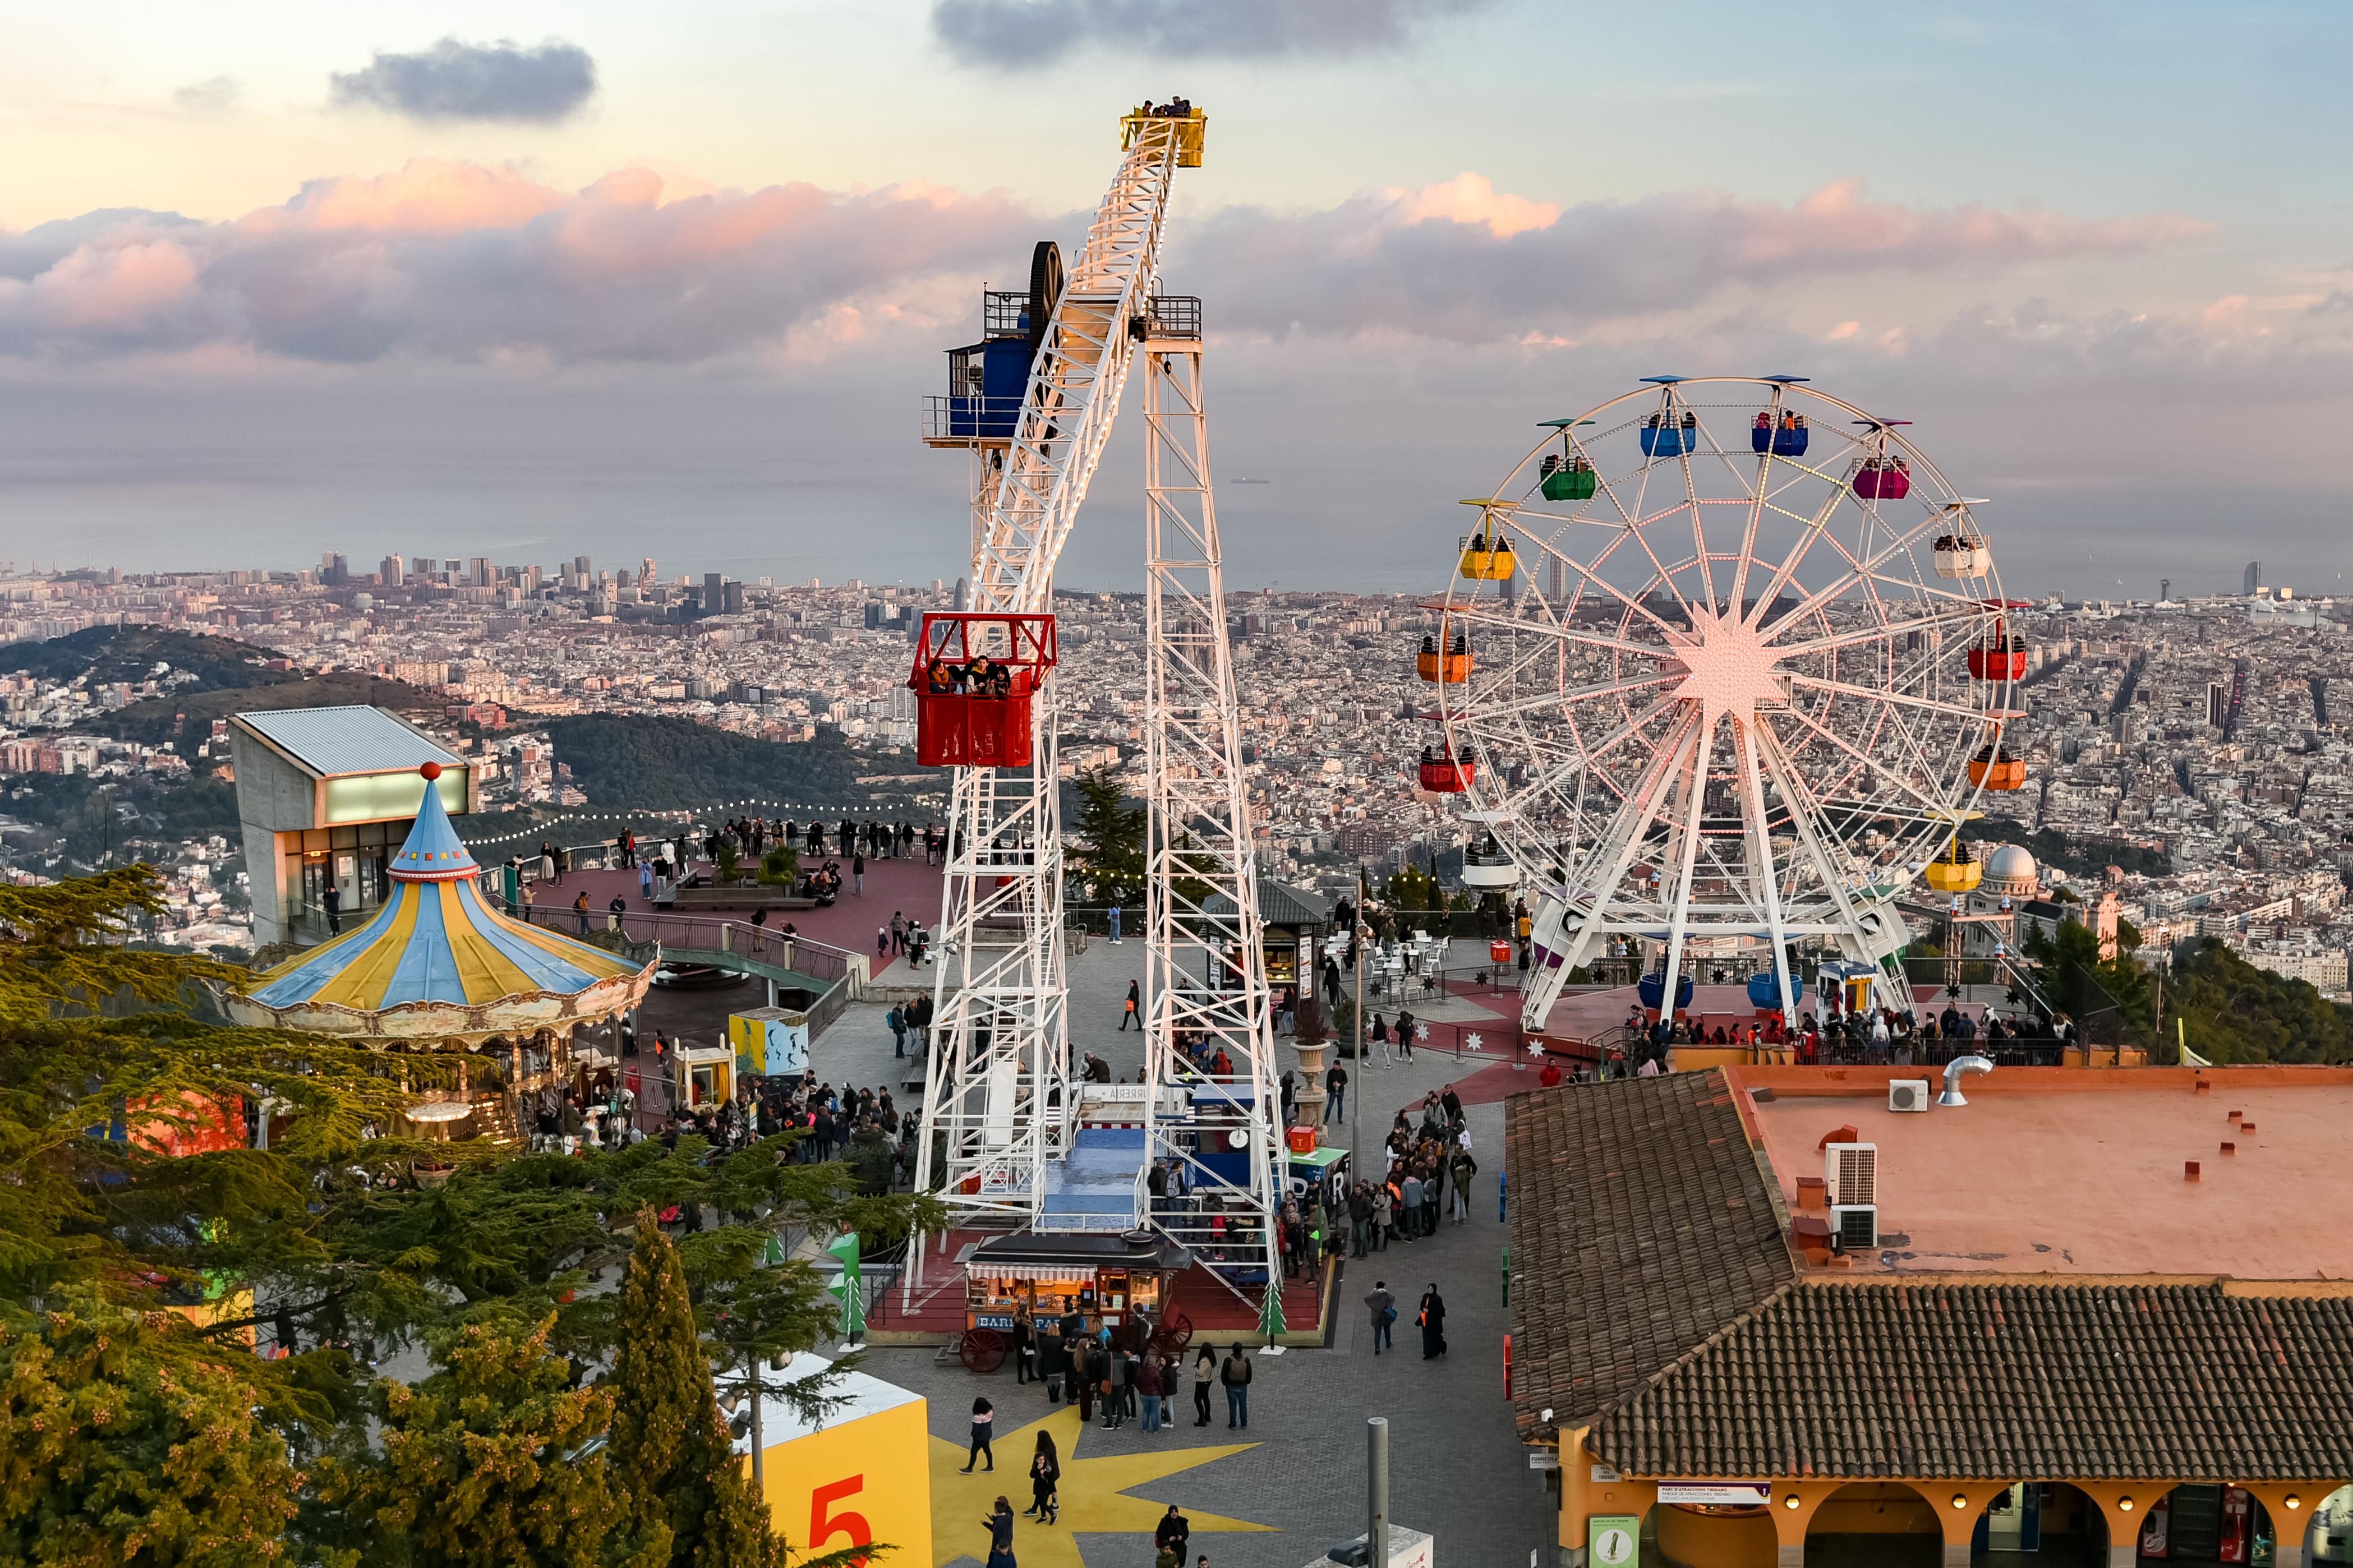 File:Parc d'Atraccions Tibidabo - 49289536031.jpg - Wikimedia Commons